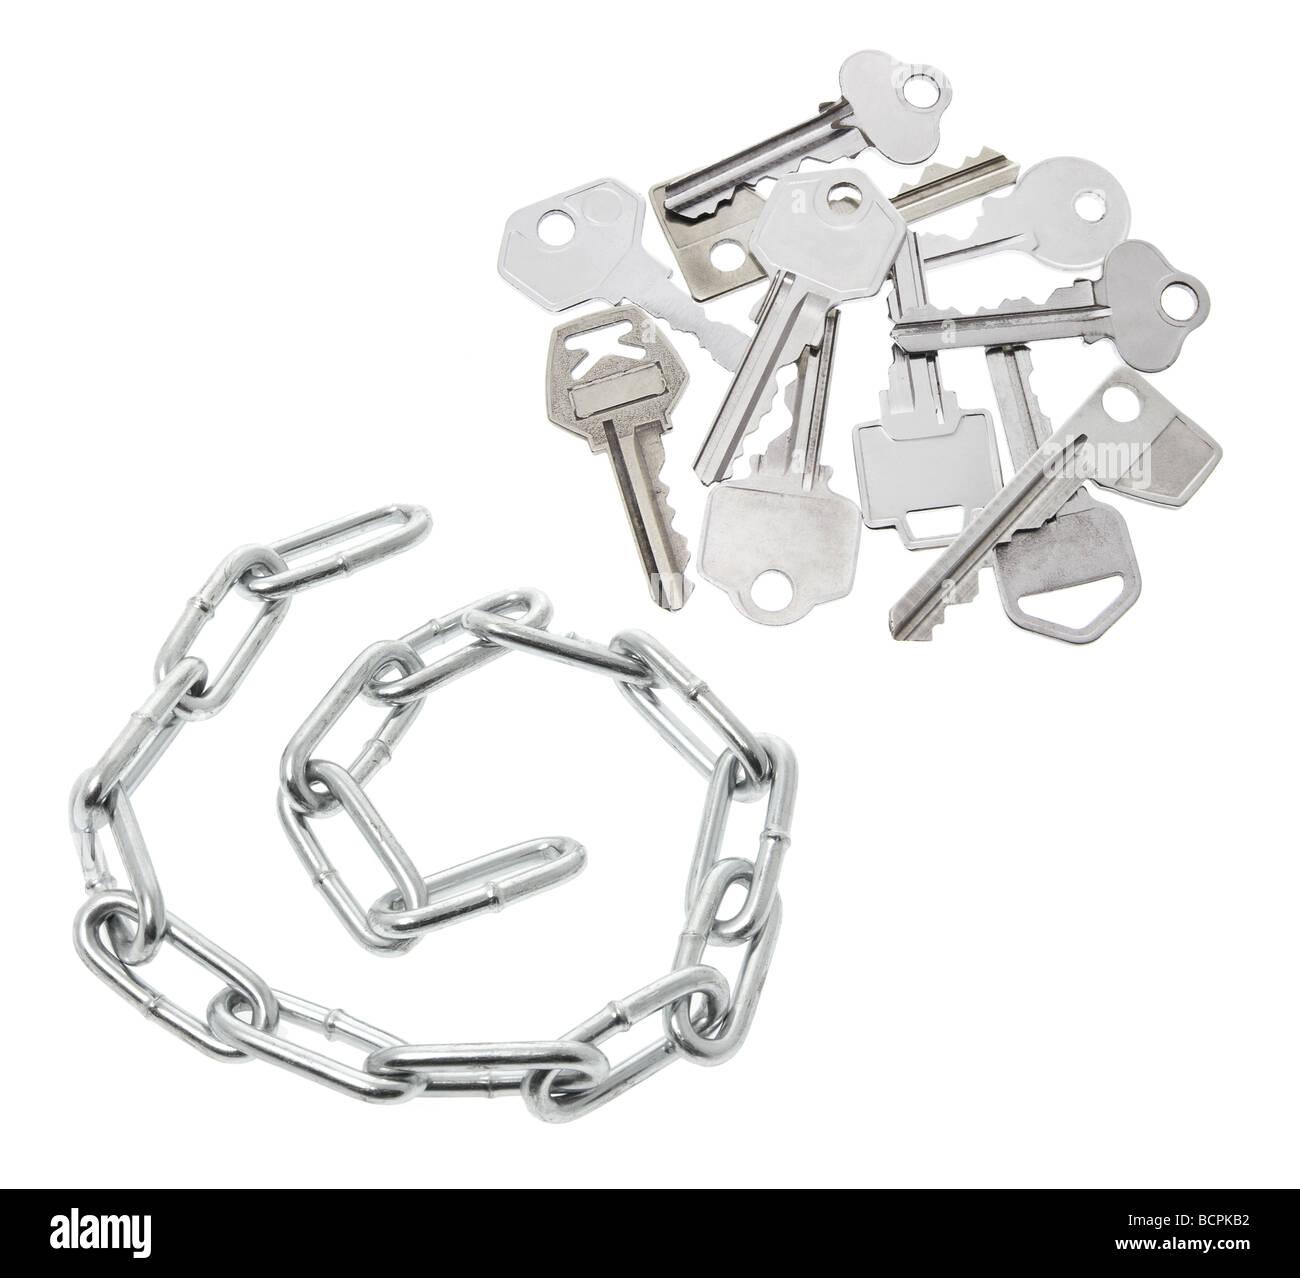 Chain and Keys Stock Photo